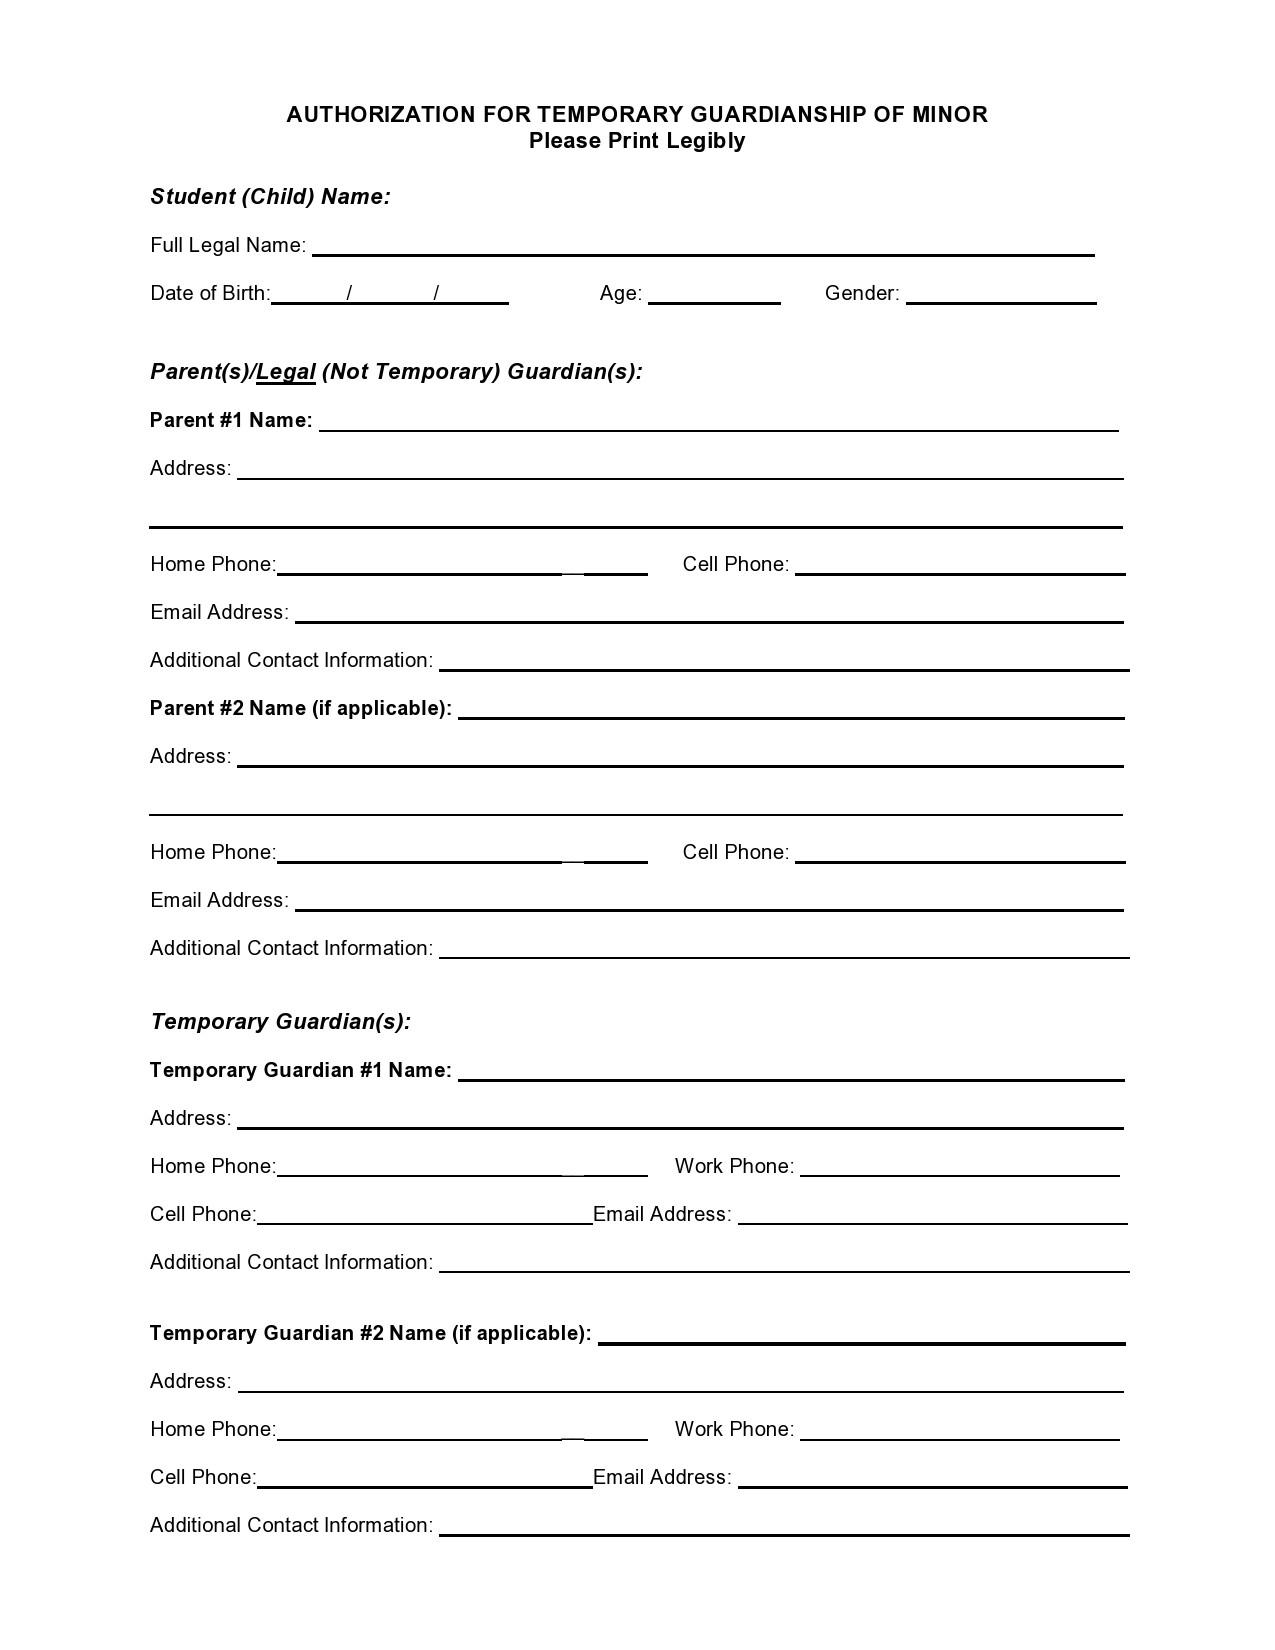 Free temporary guardianship form 06